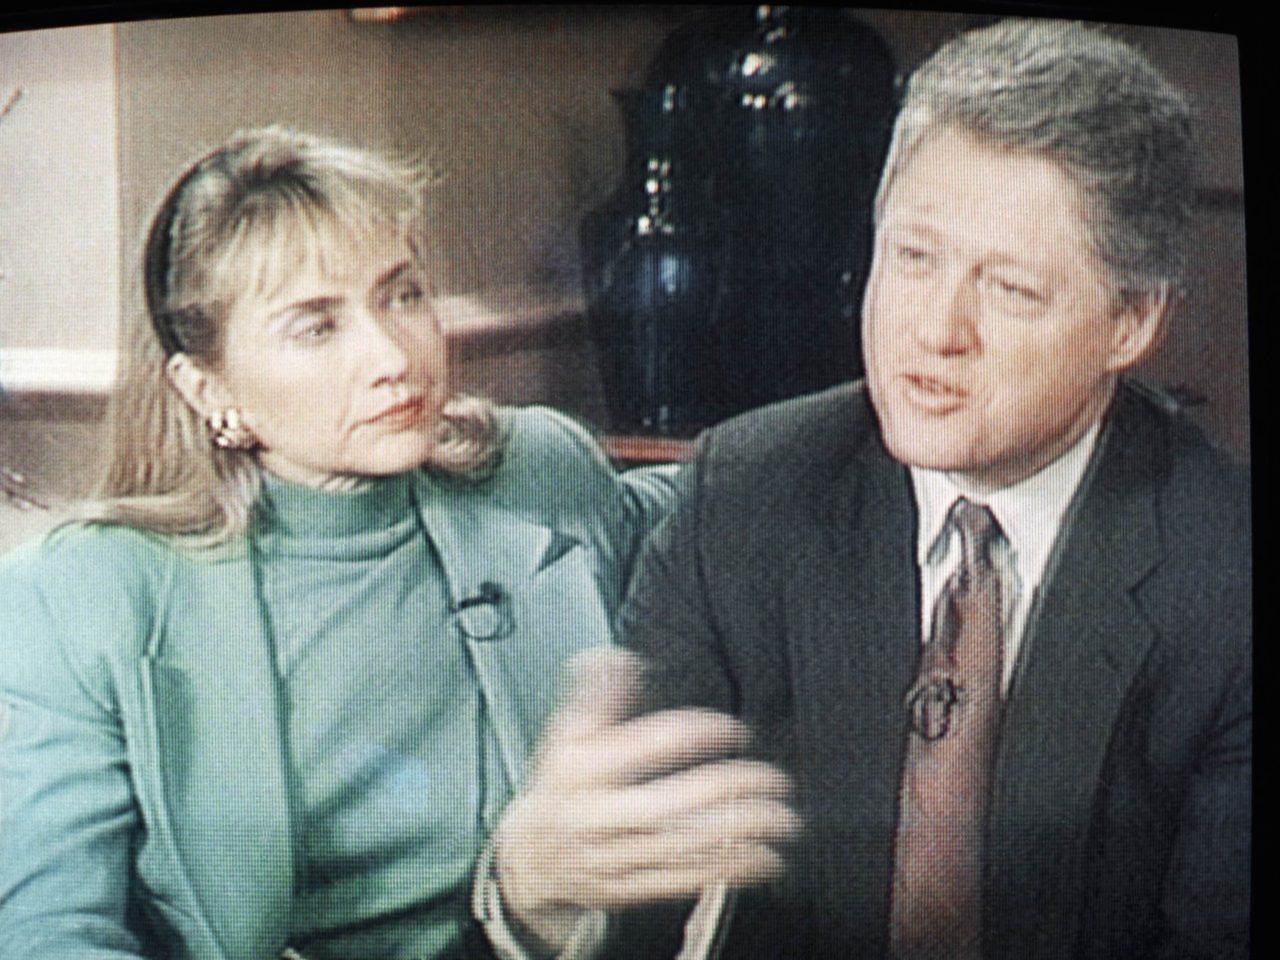 Clinton bill accusers sex scandals